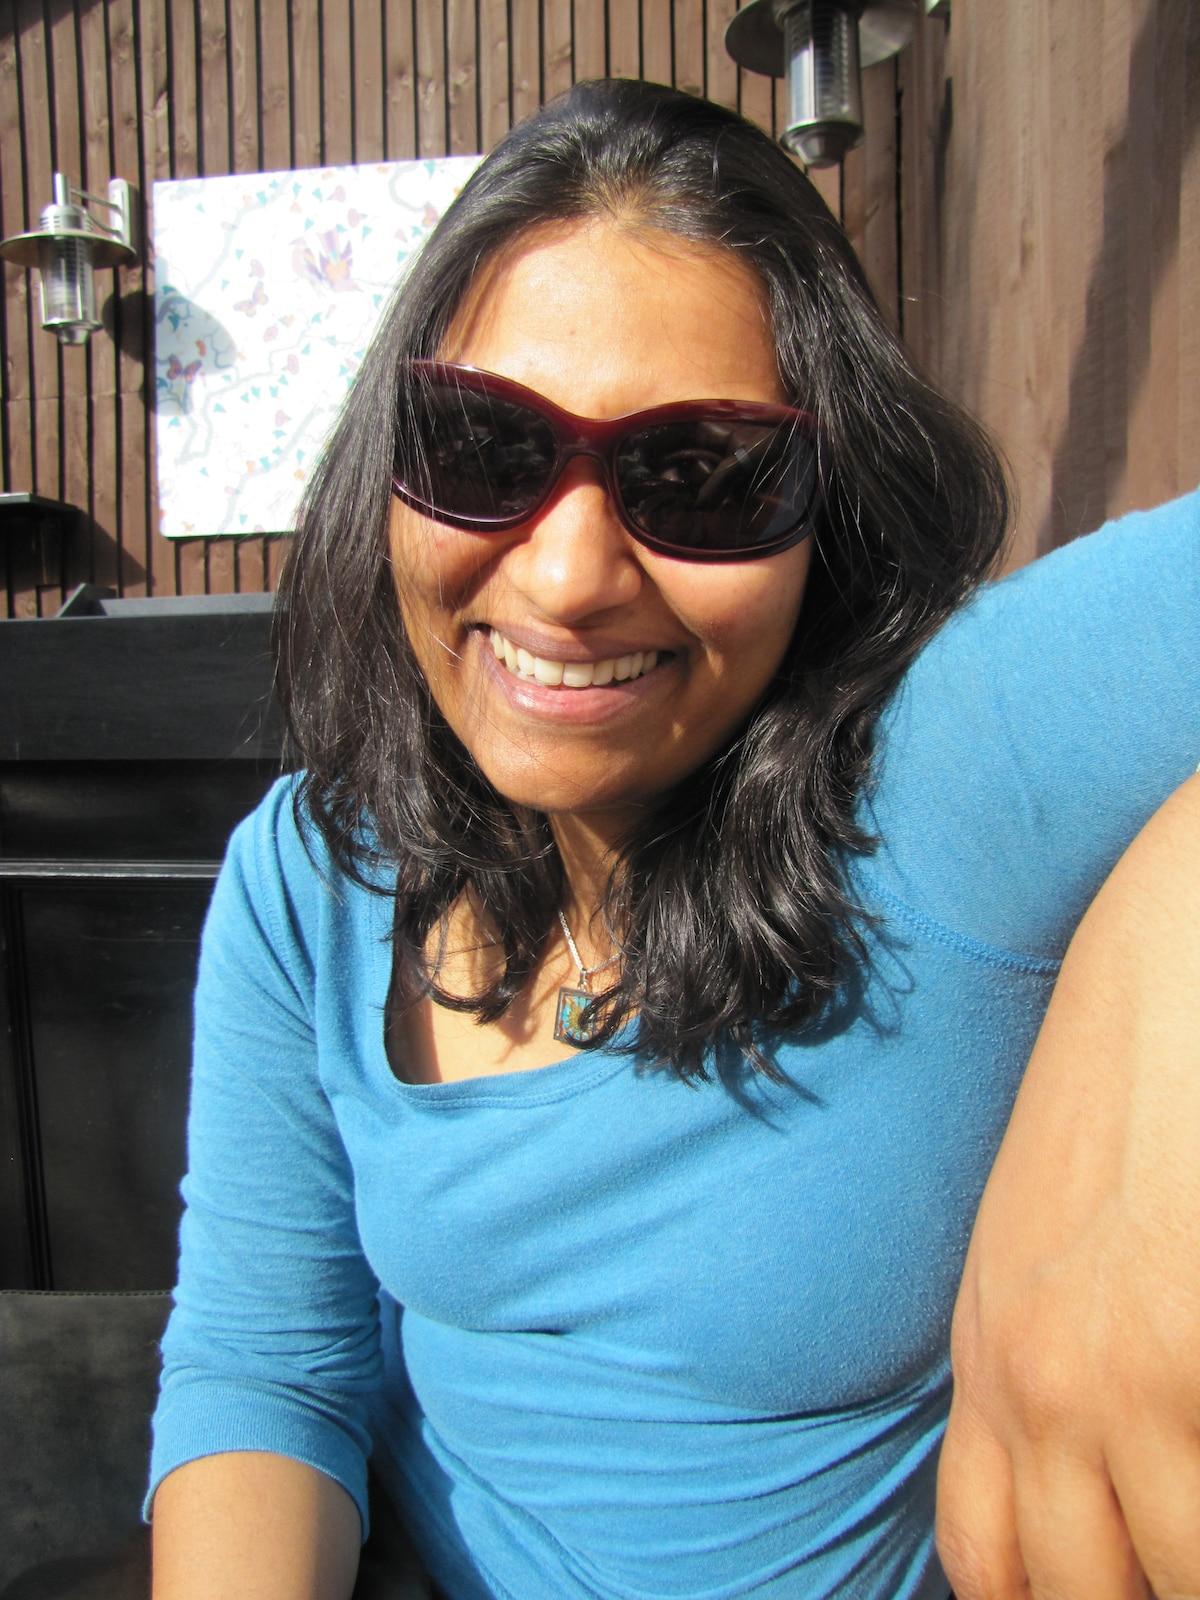 Vinita from London